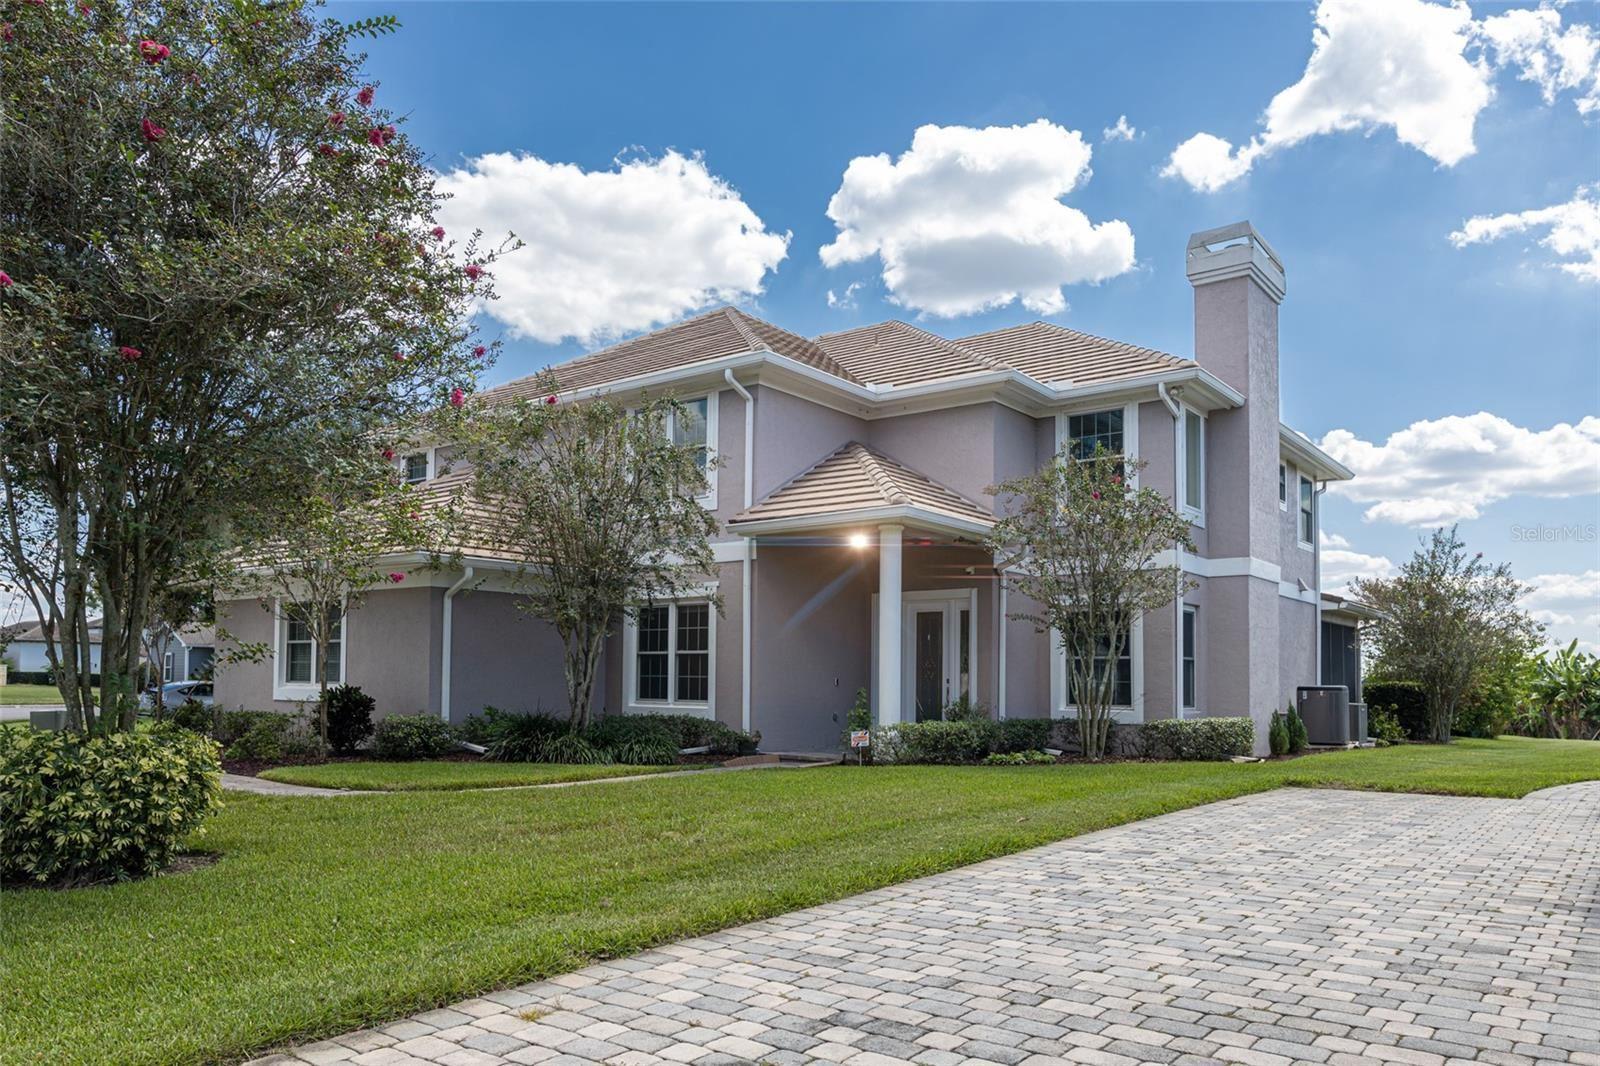 Photo of 13120 ZORI LANE, WINDERMERE, FL 34786 (MLS # S5057196)